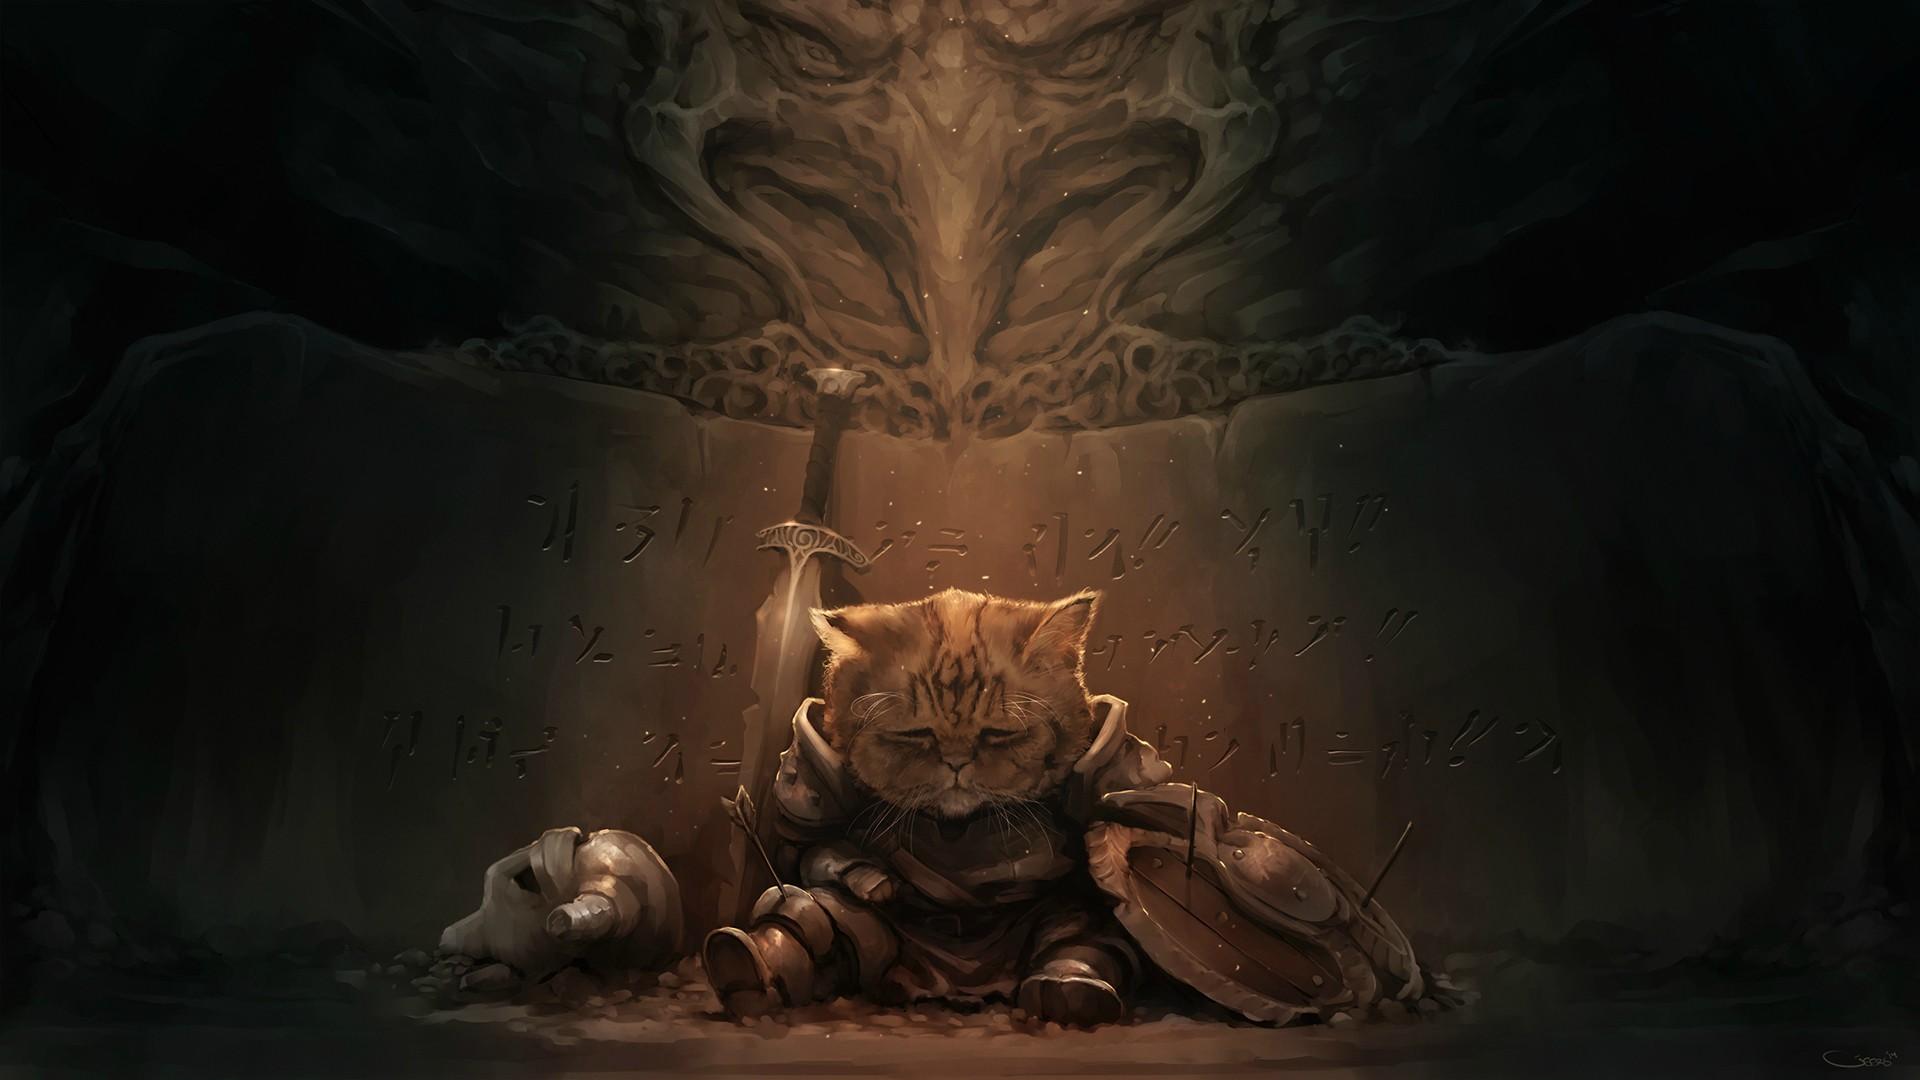 Lirik Darren Geers cat artwork video games Geers Art The 1920x1080